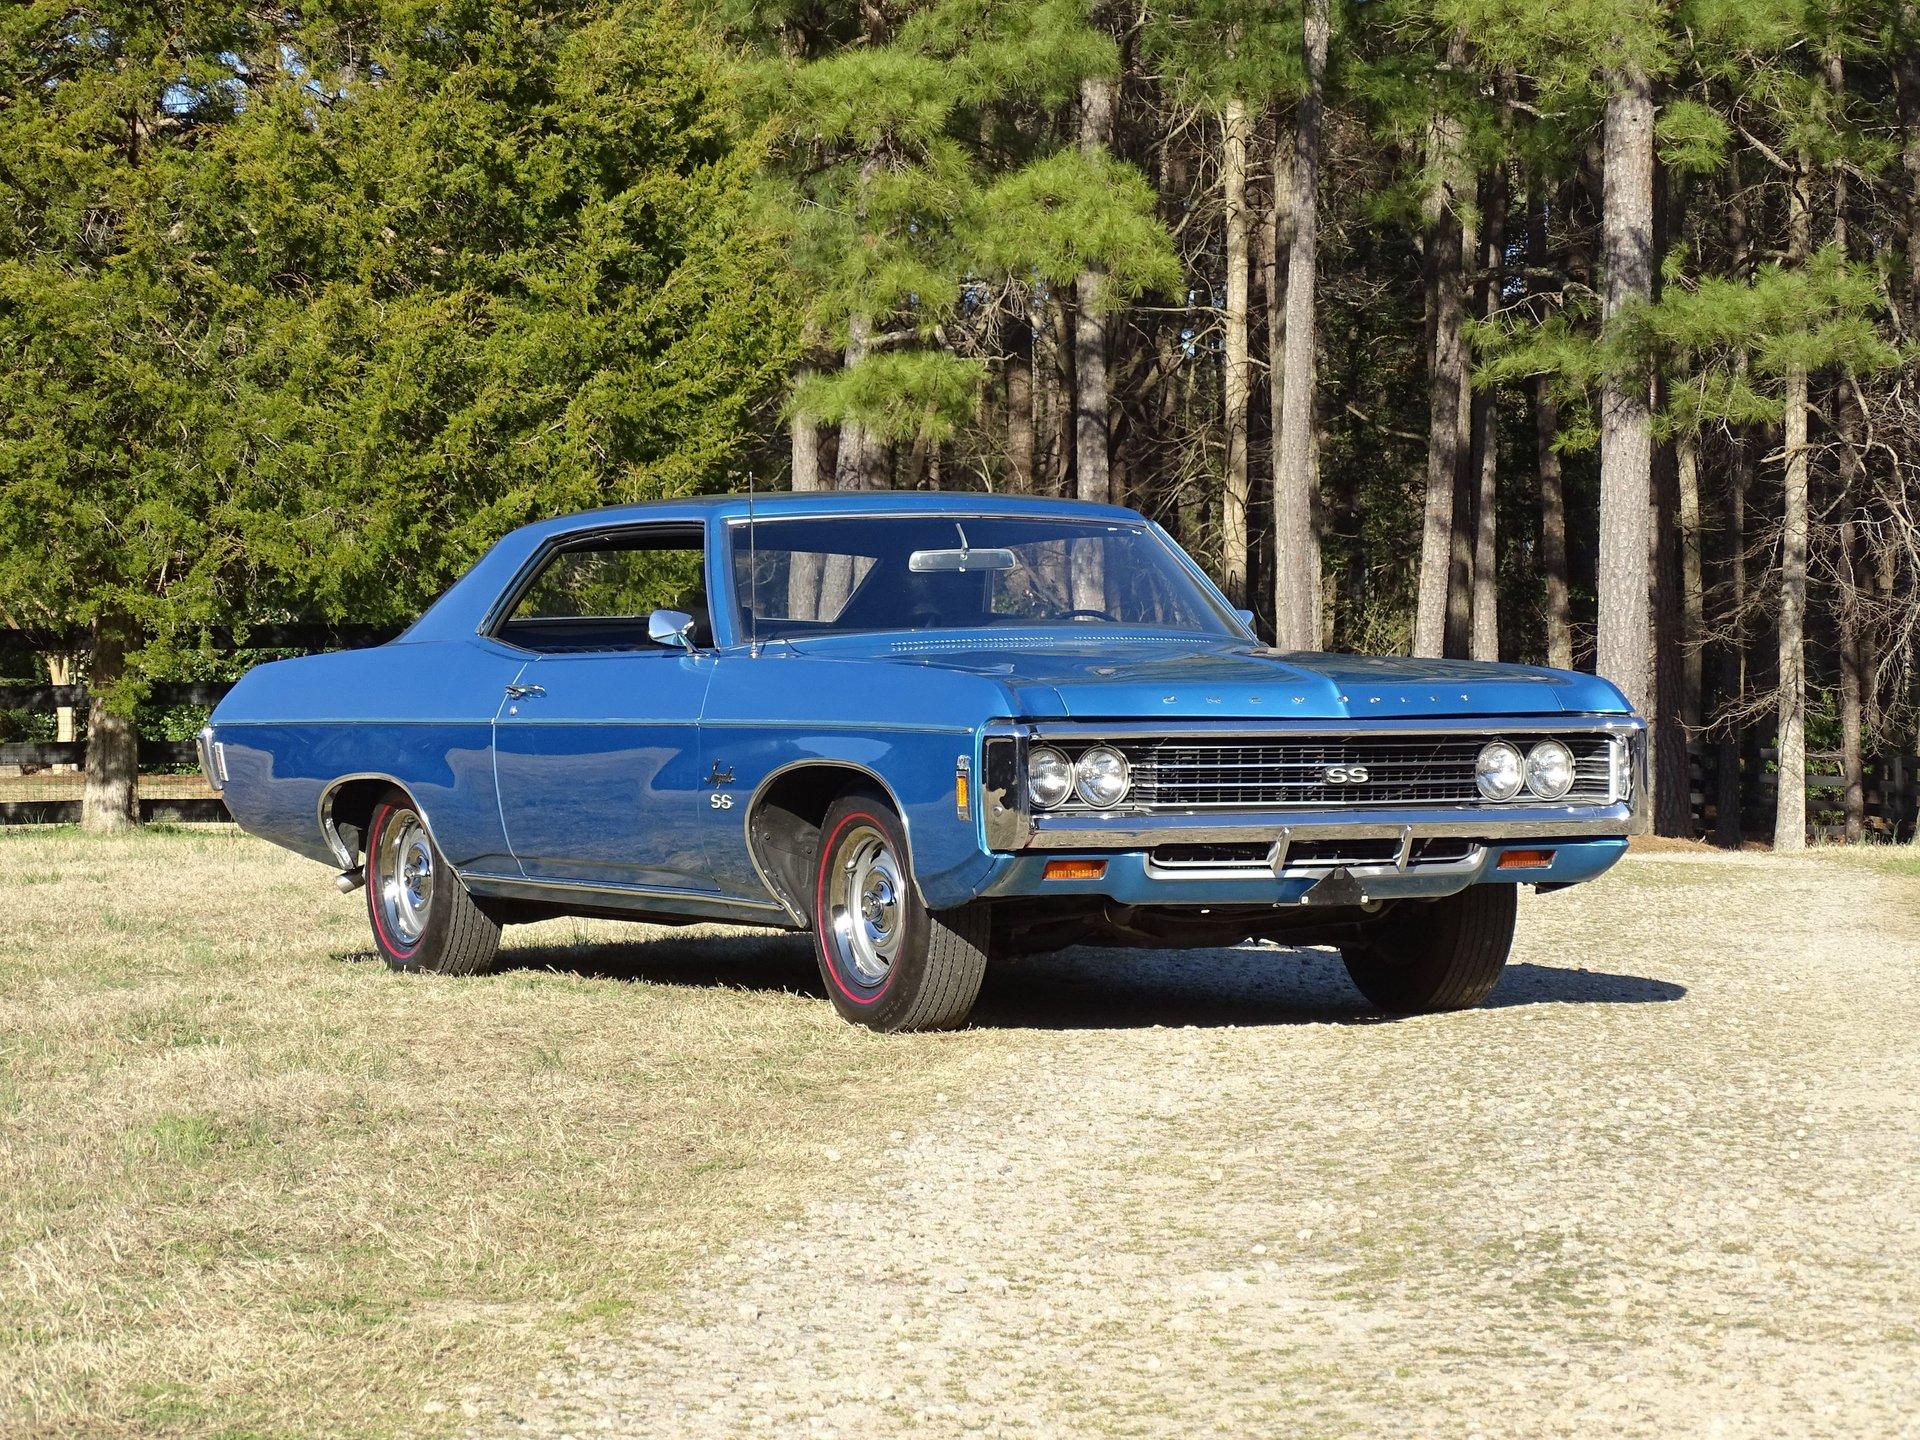 1969 chevrolet impala ss